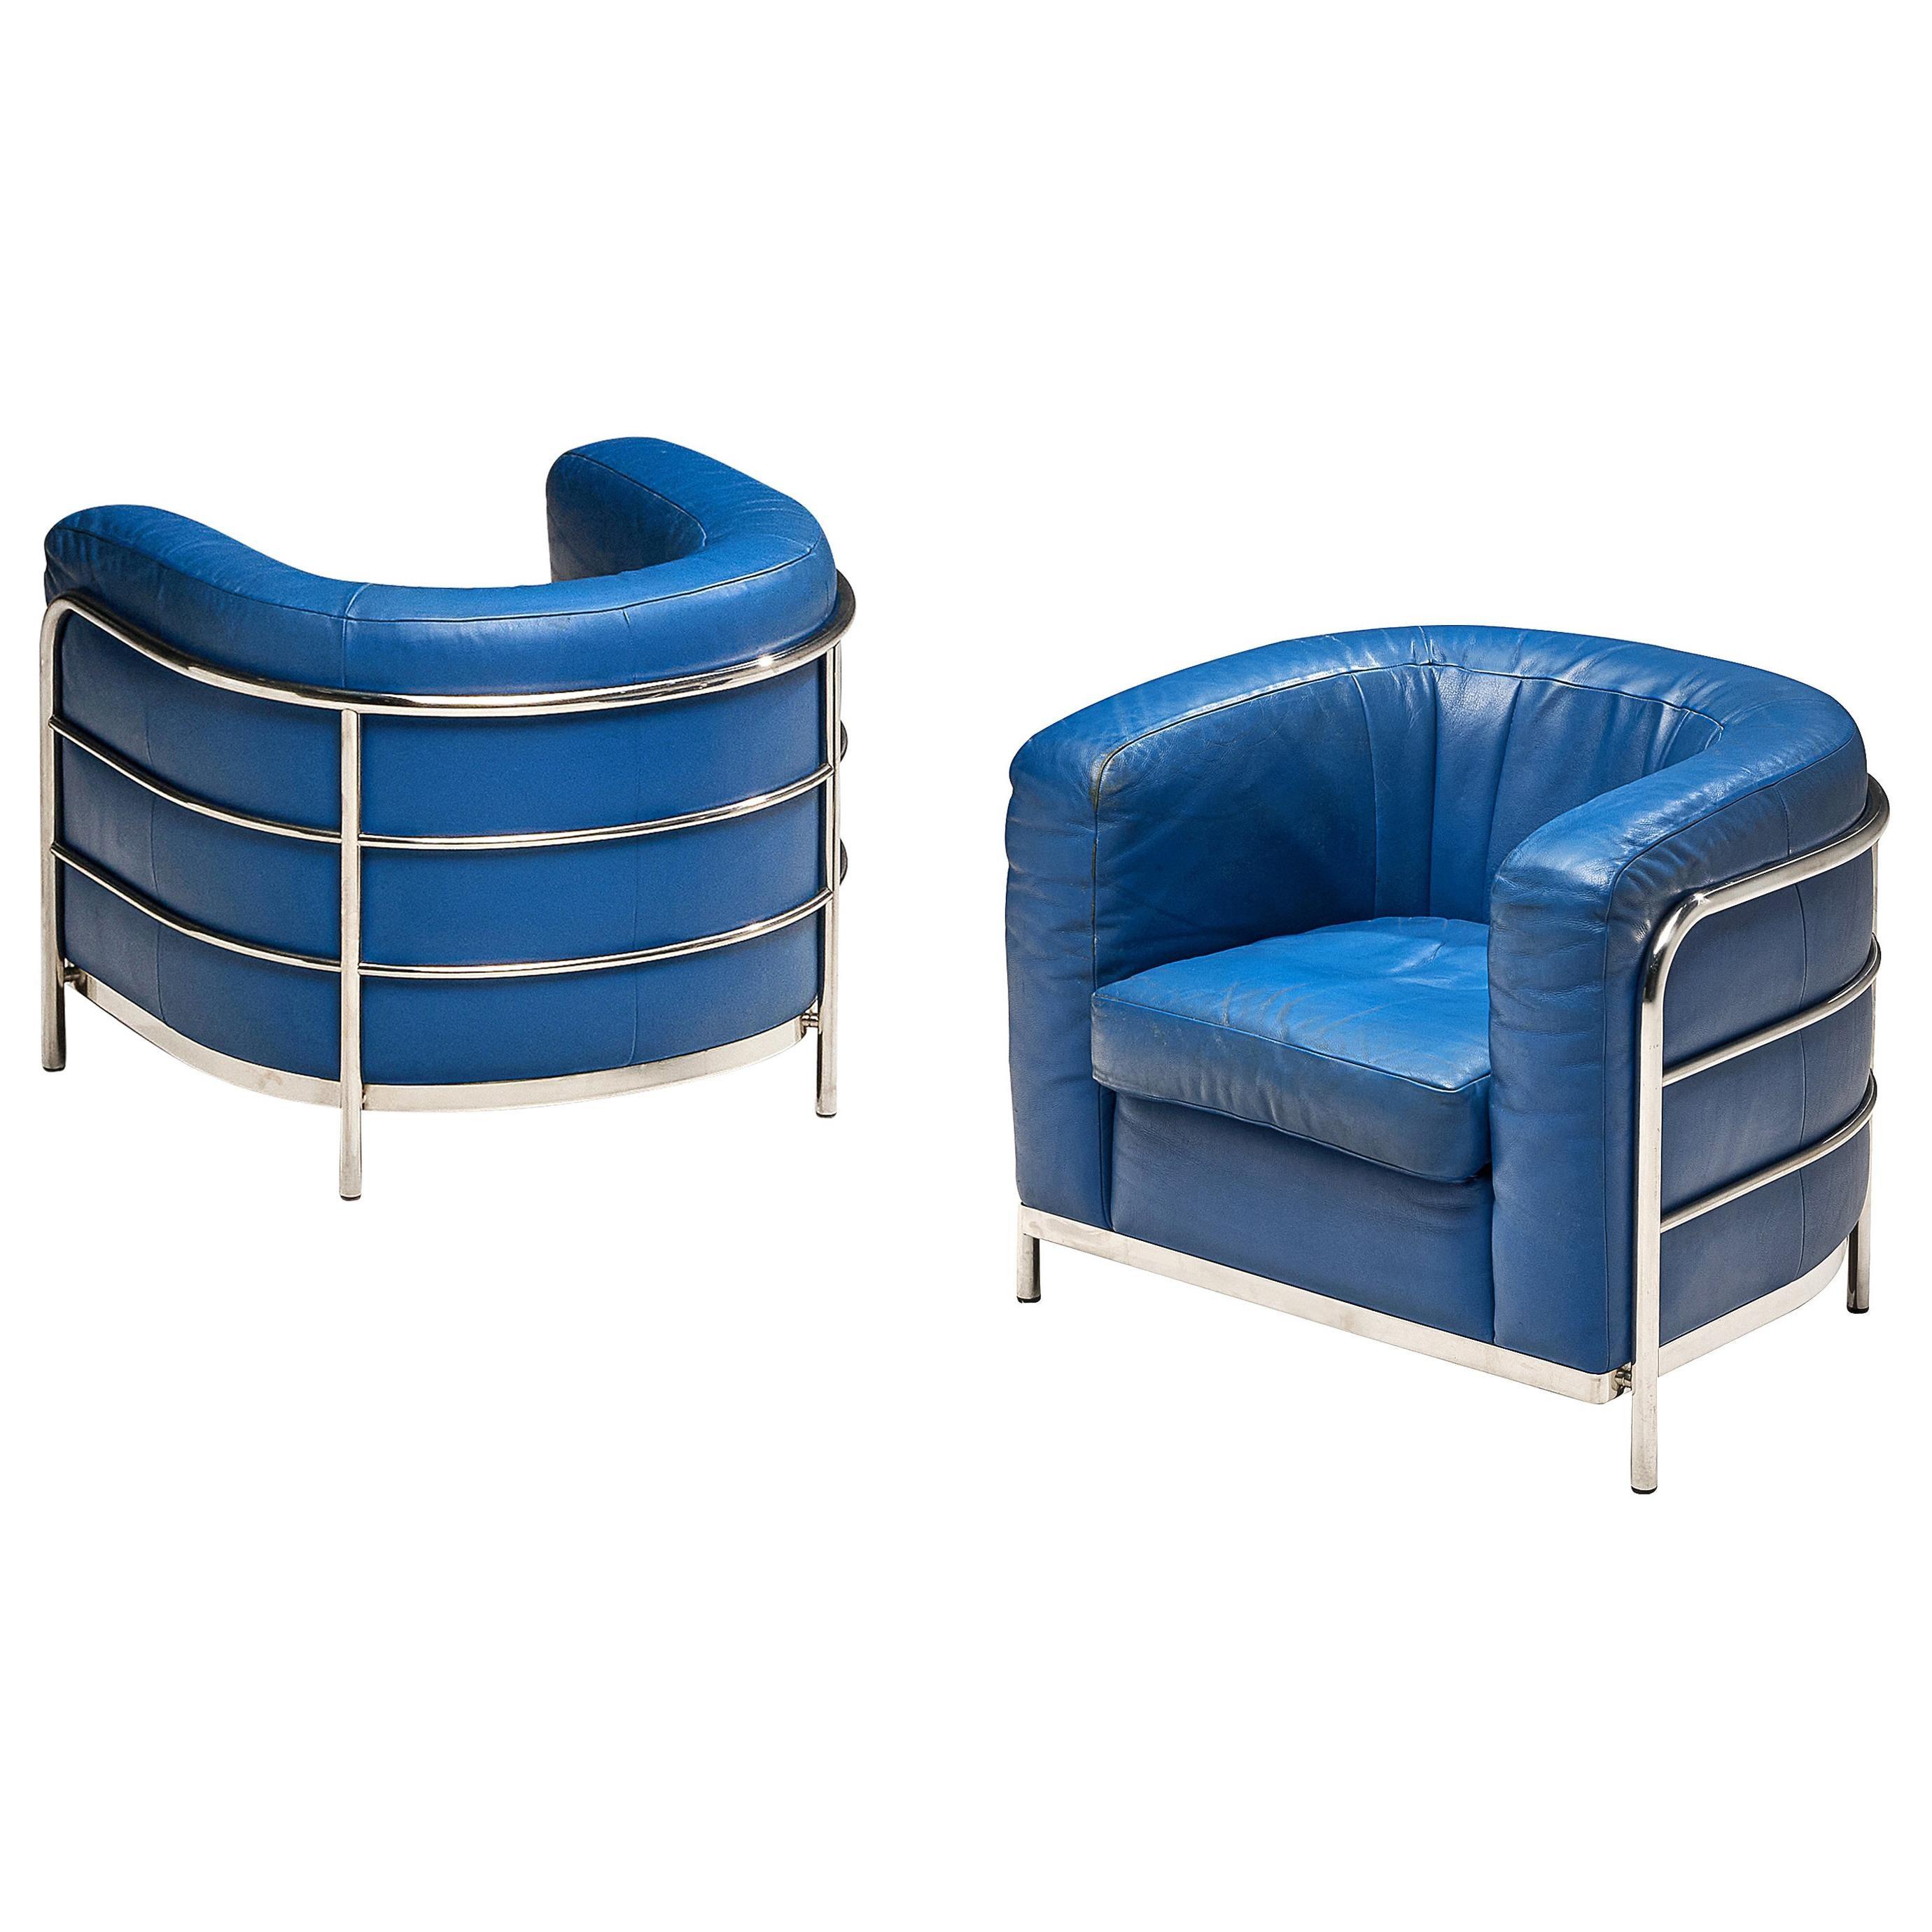 Pair of 'Onda' Lounge Chairs by De Pas D'Urbino and Lomazzi for Zanotta